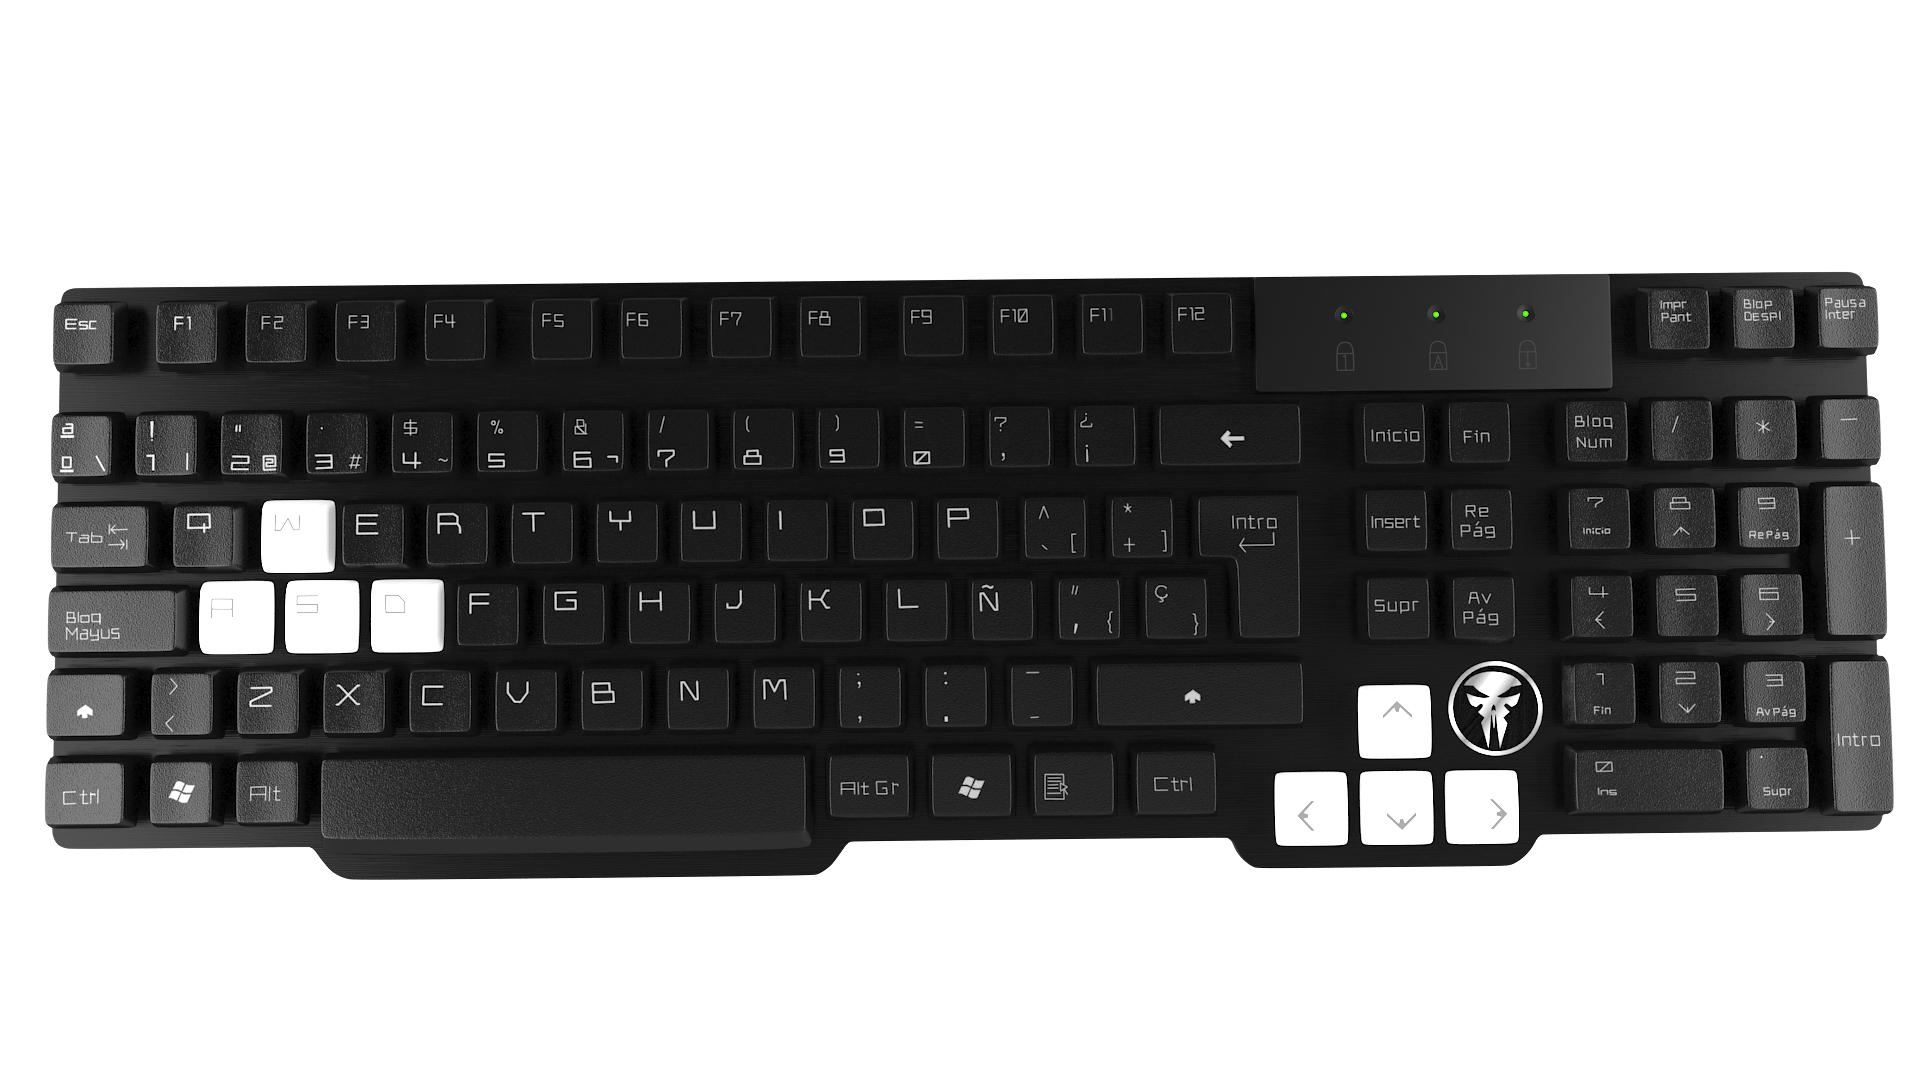 Mars Gaming MKHA0 keyboard USB Black,White